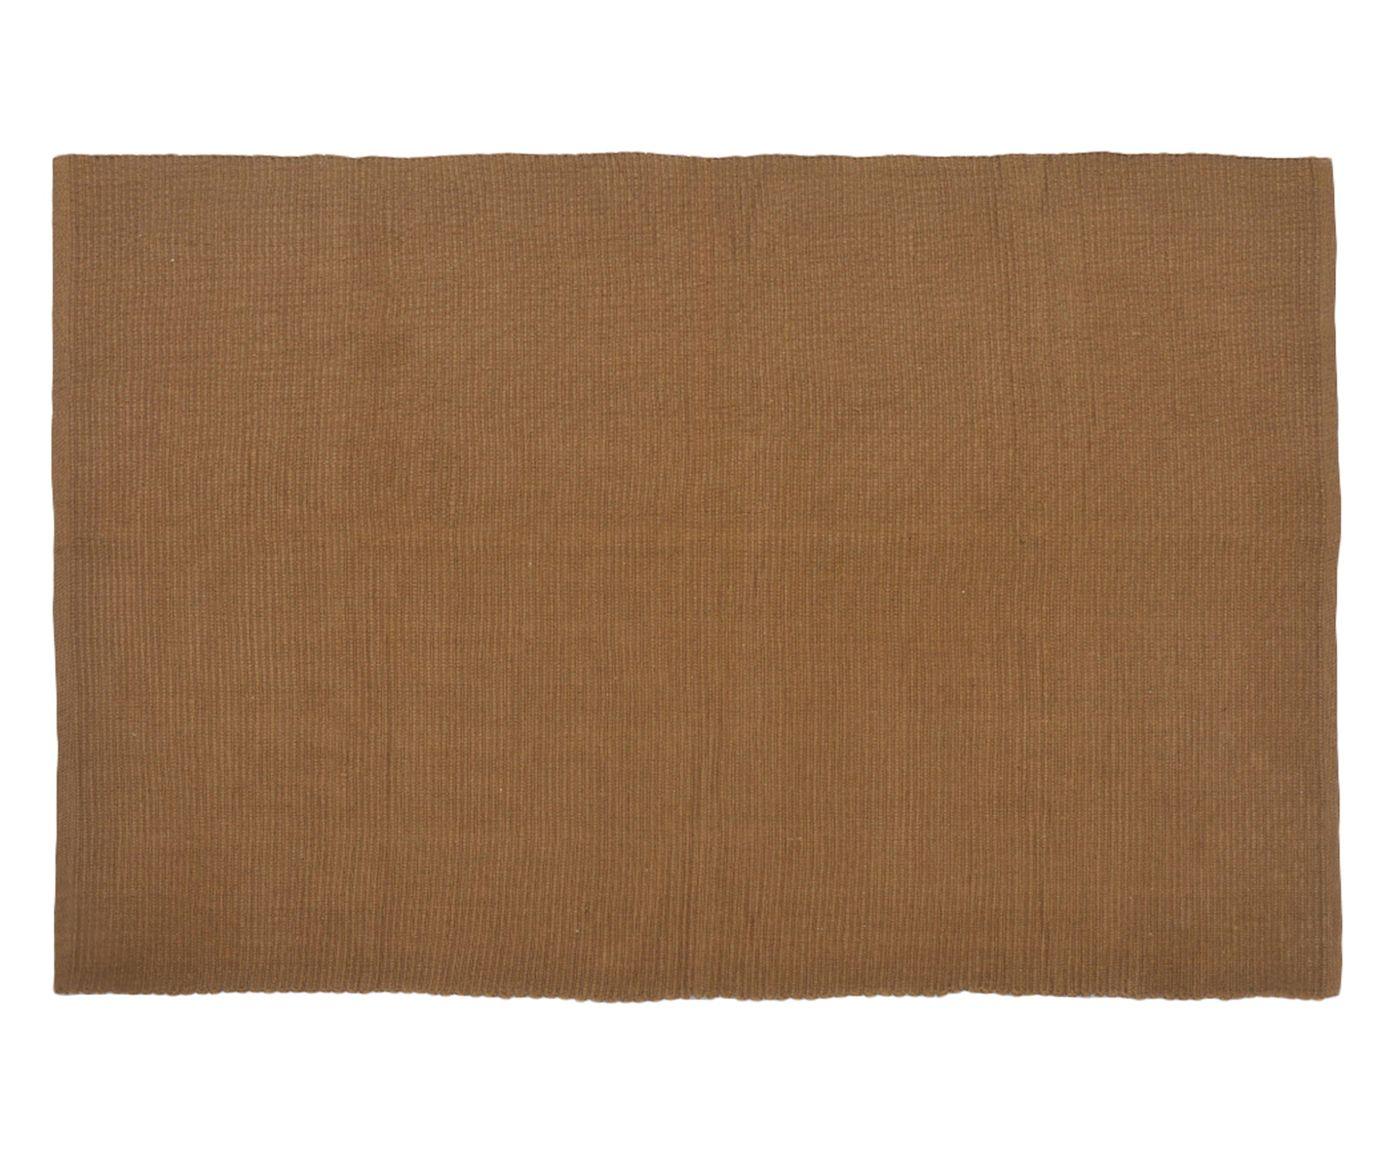 Tapete Indiano Mahavidya Marrom - 120x180cm   Westwing.com.br